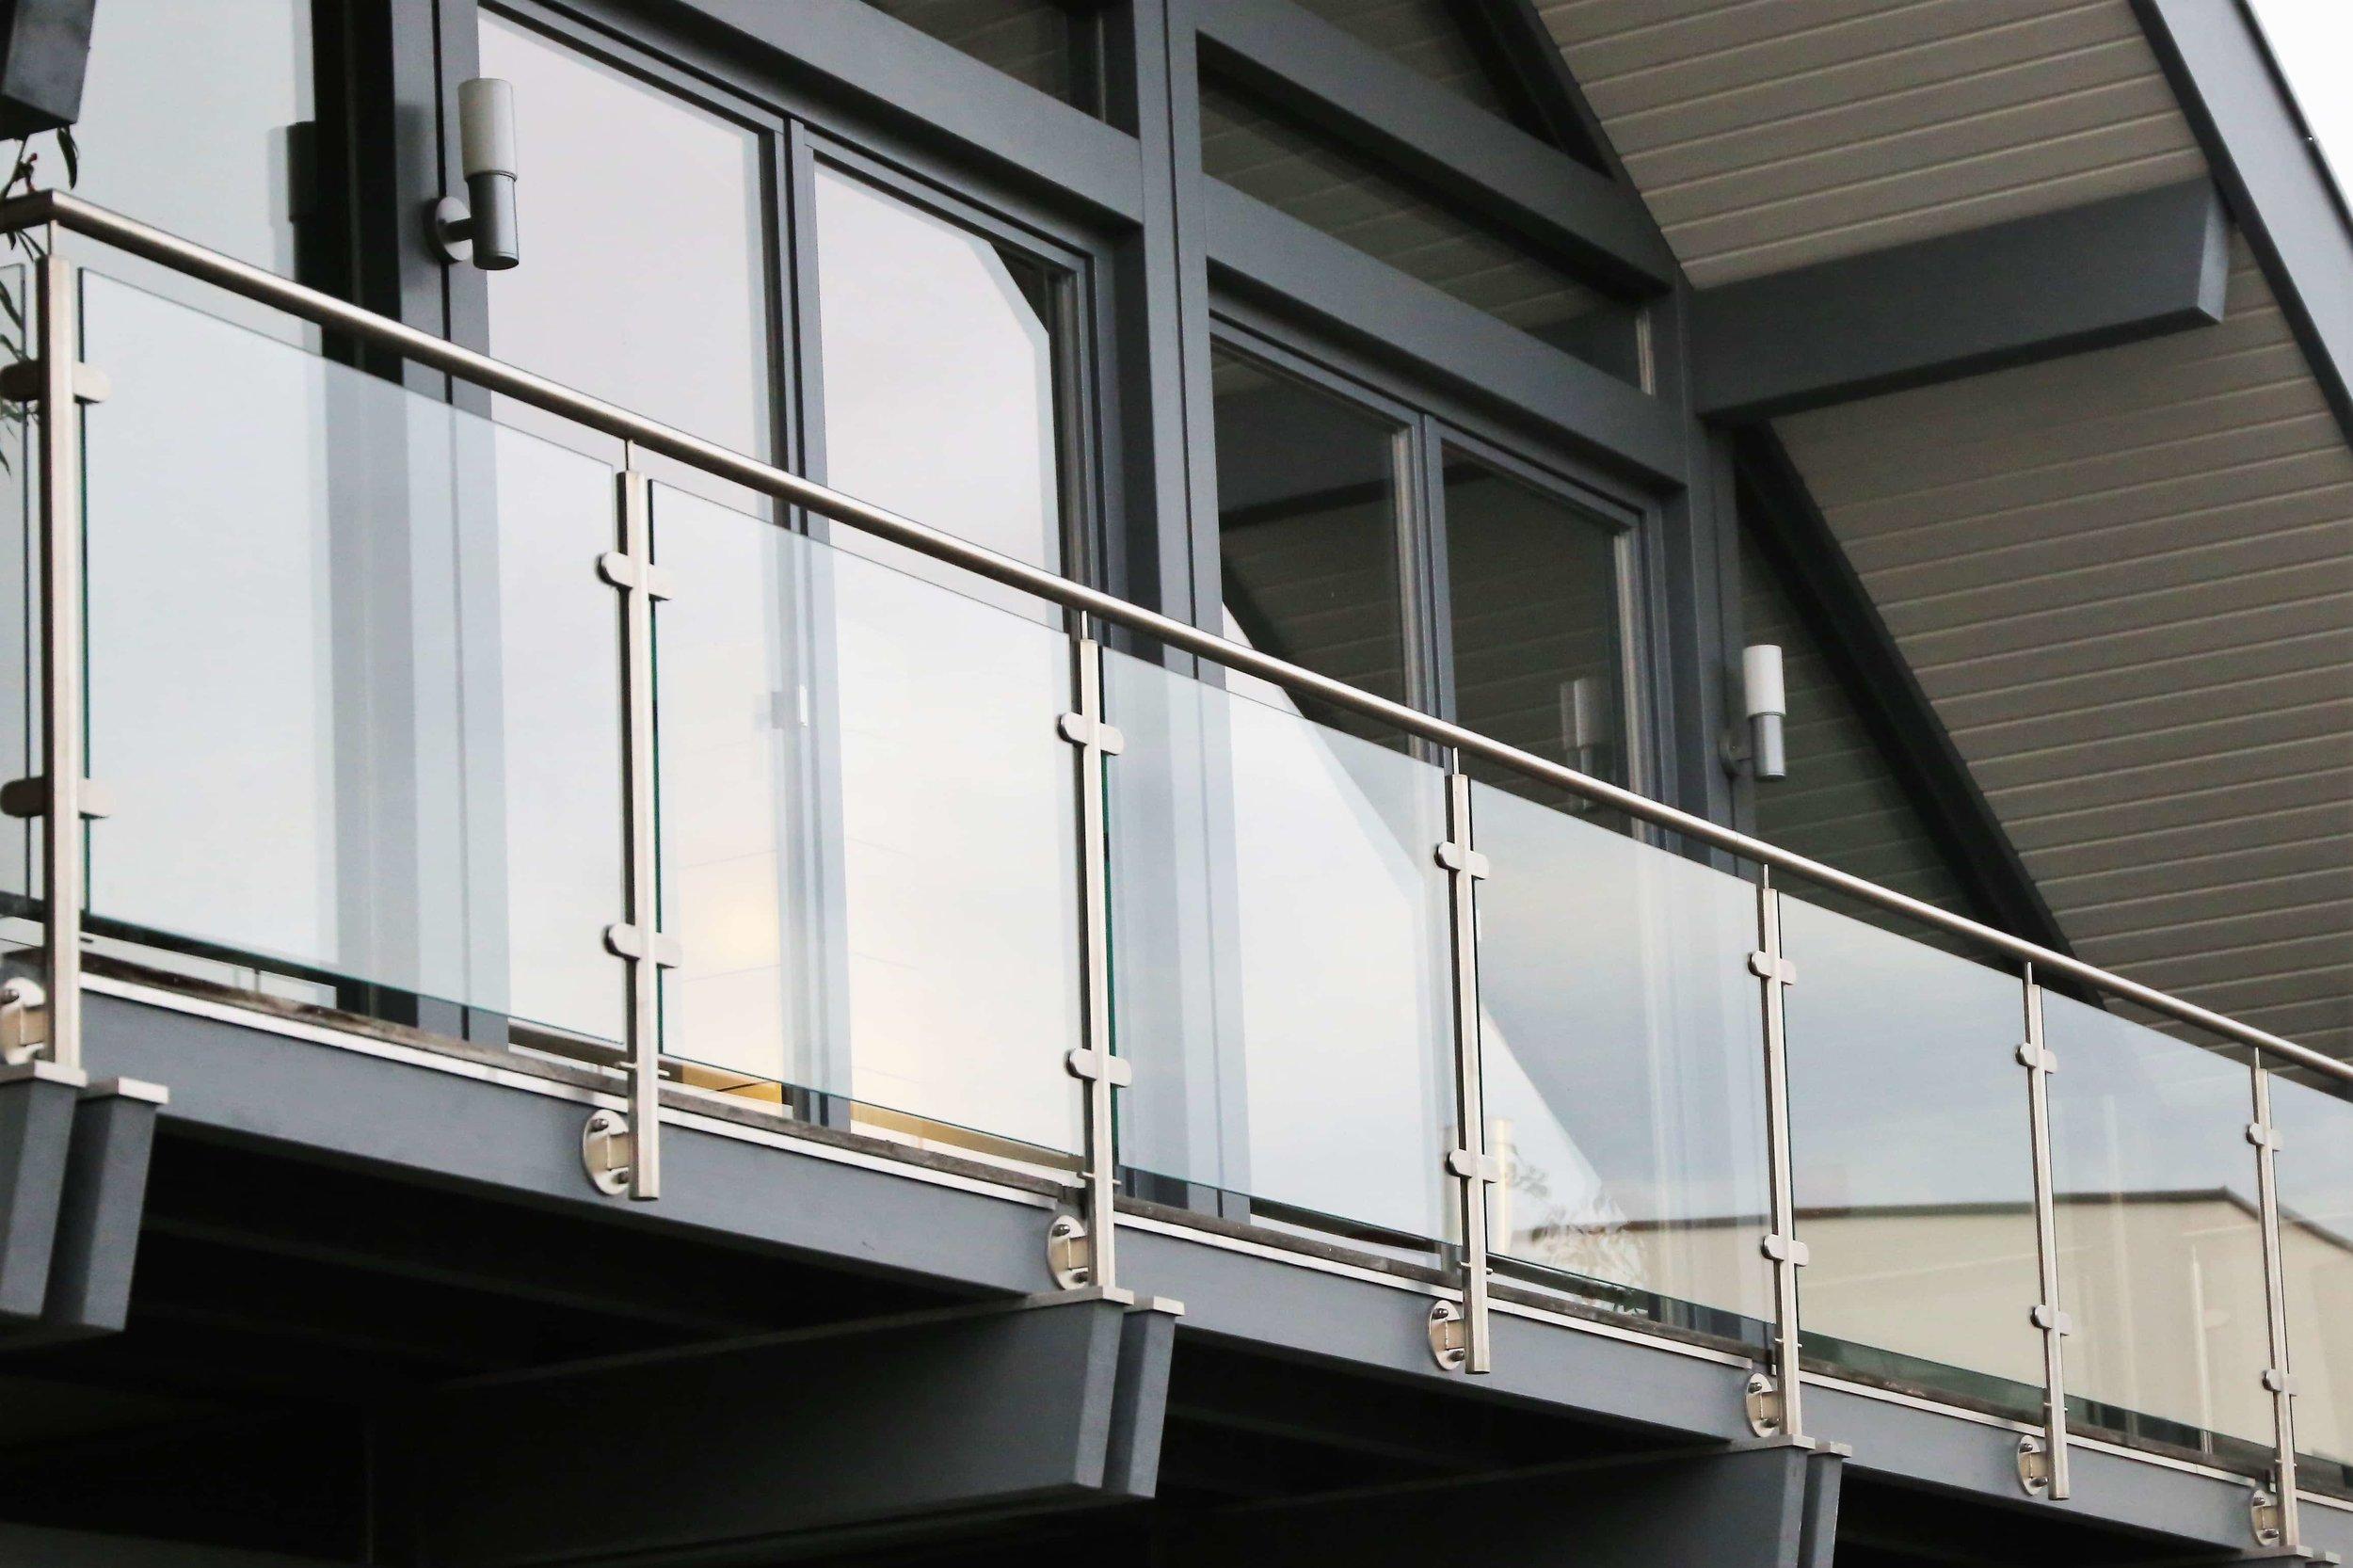 fence-deck-glass.jpeg